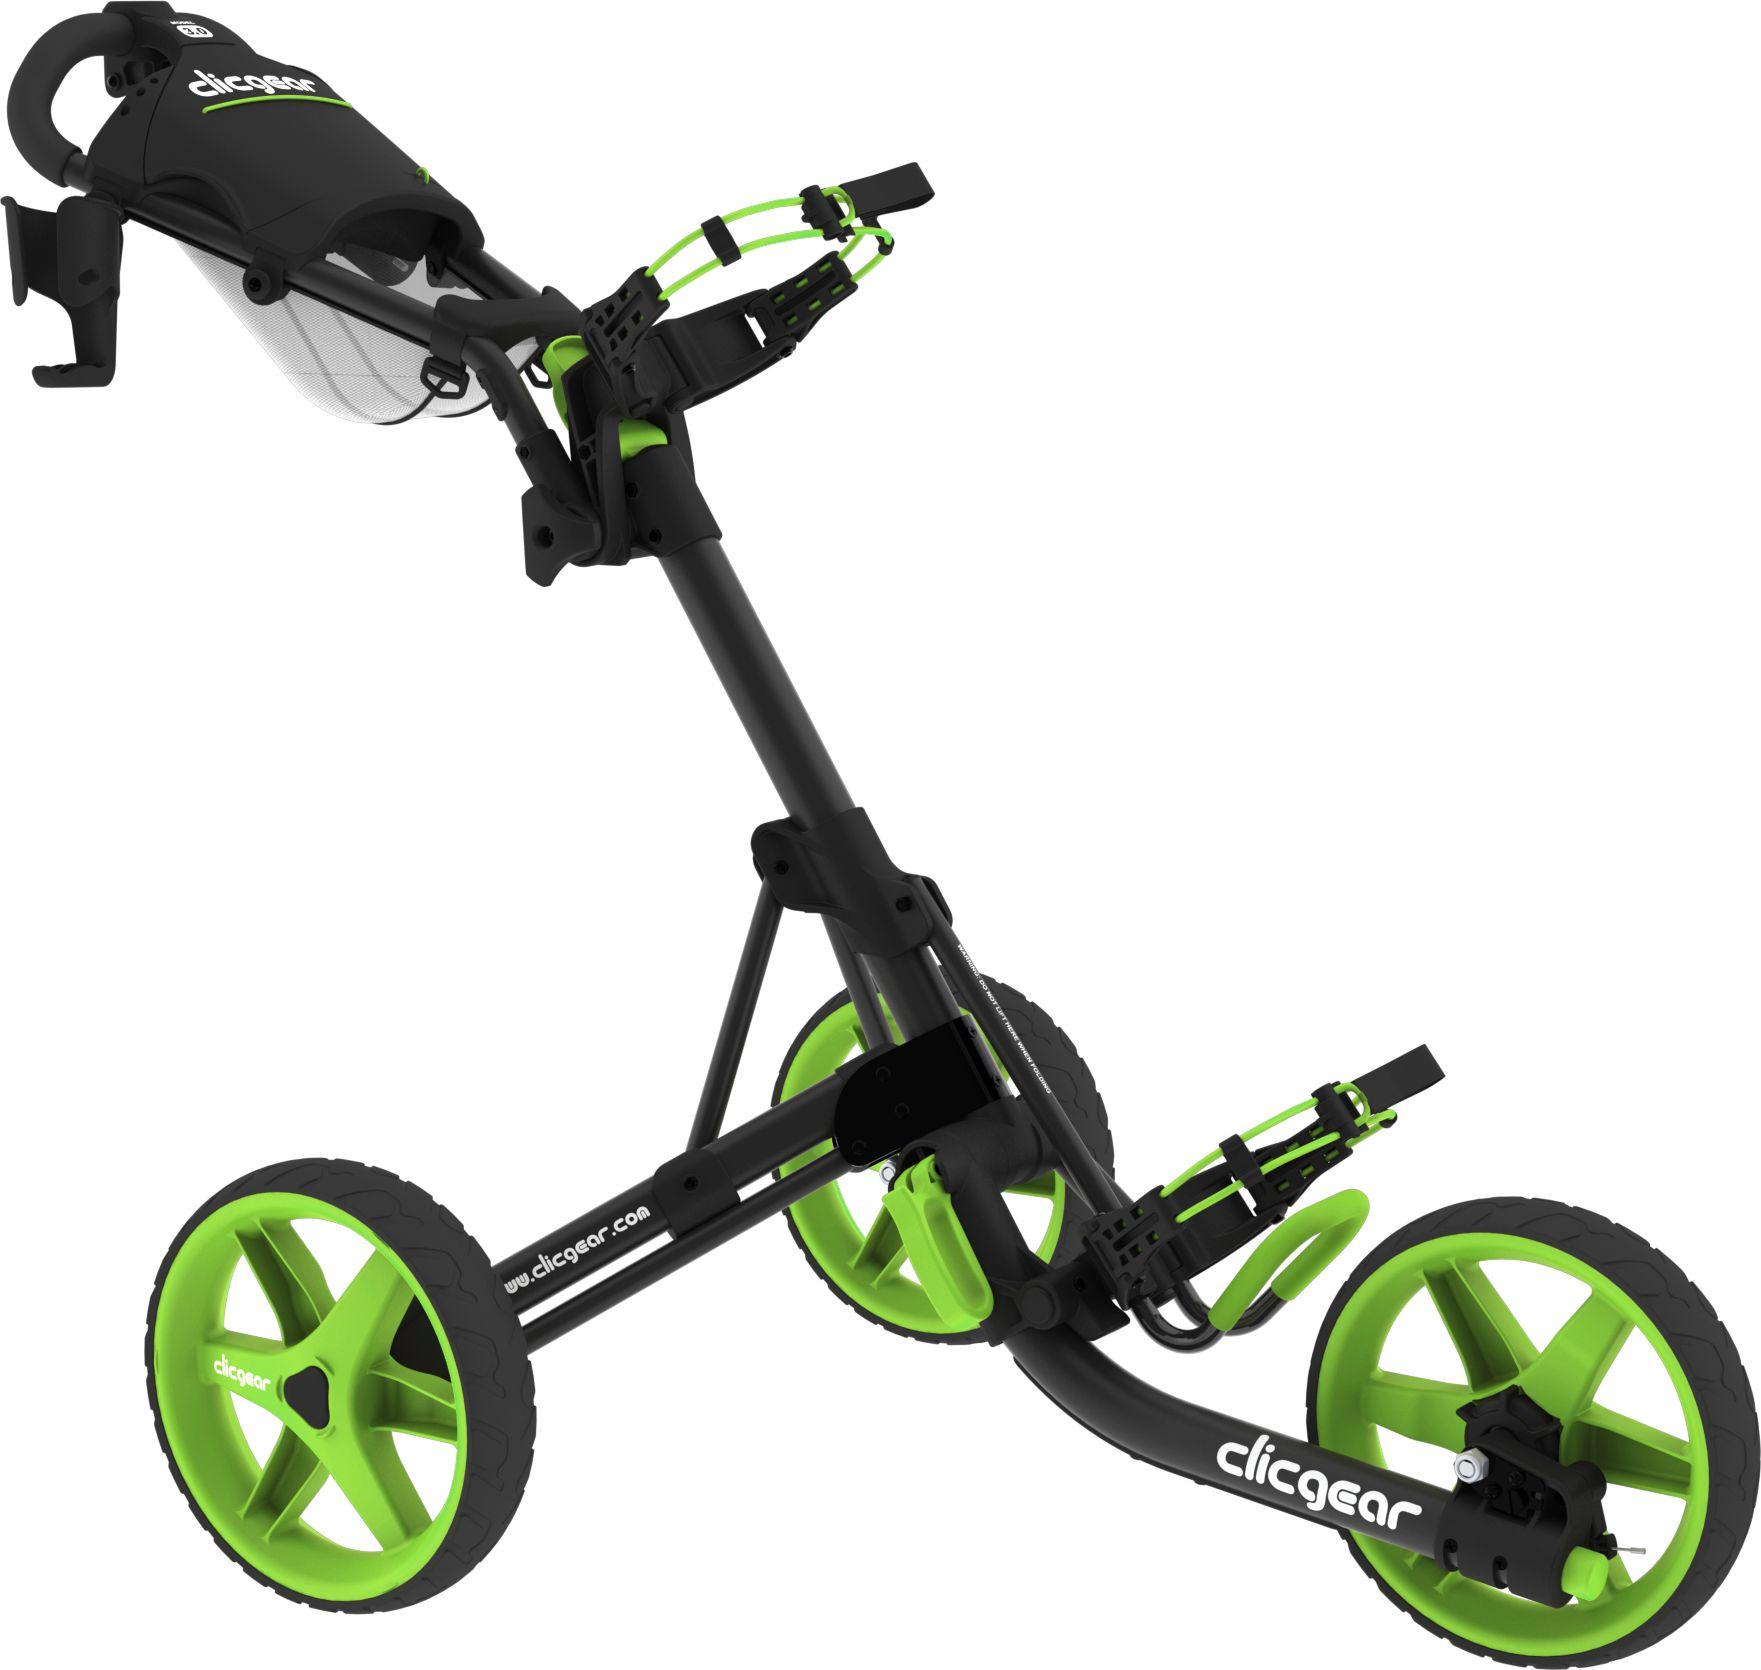 Clicgear 3.0 Push Cart